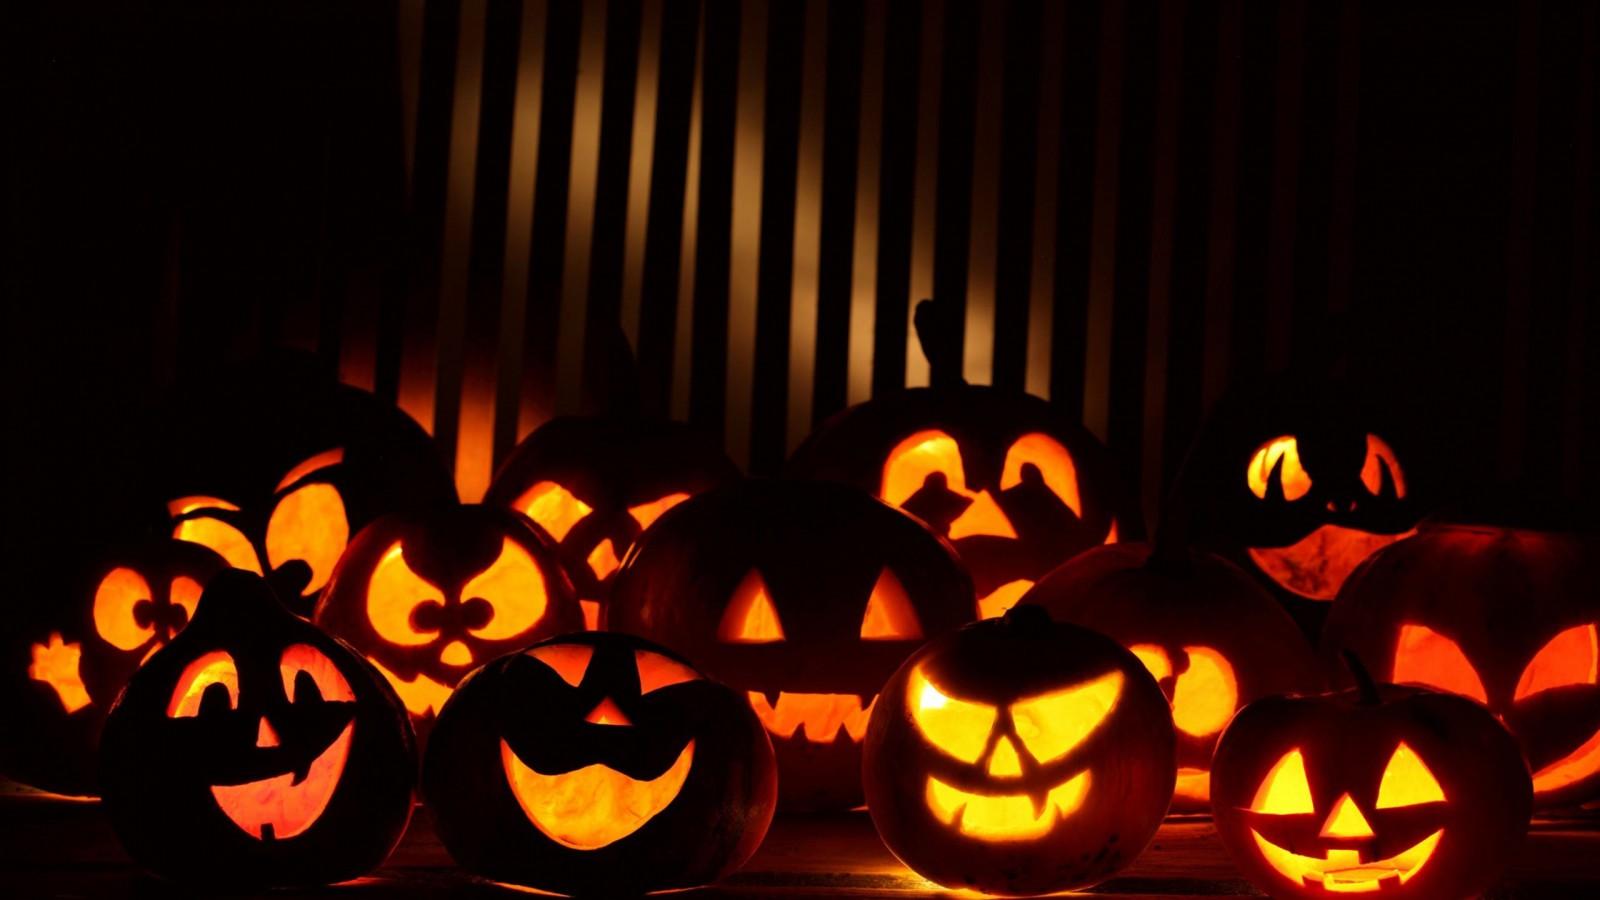 happy_halloween-wallpaper-2560×1600-dusicky-obrazky-na-plochu-dyna-dyne